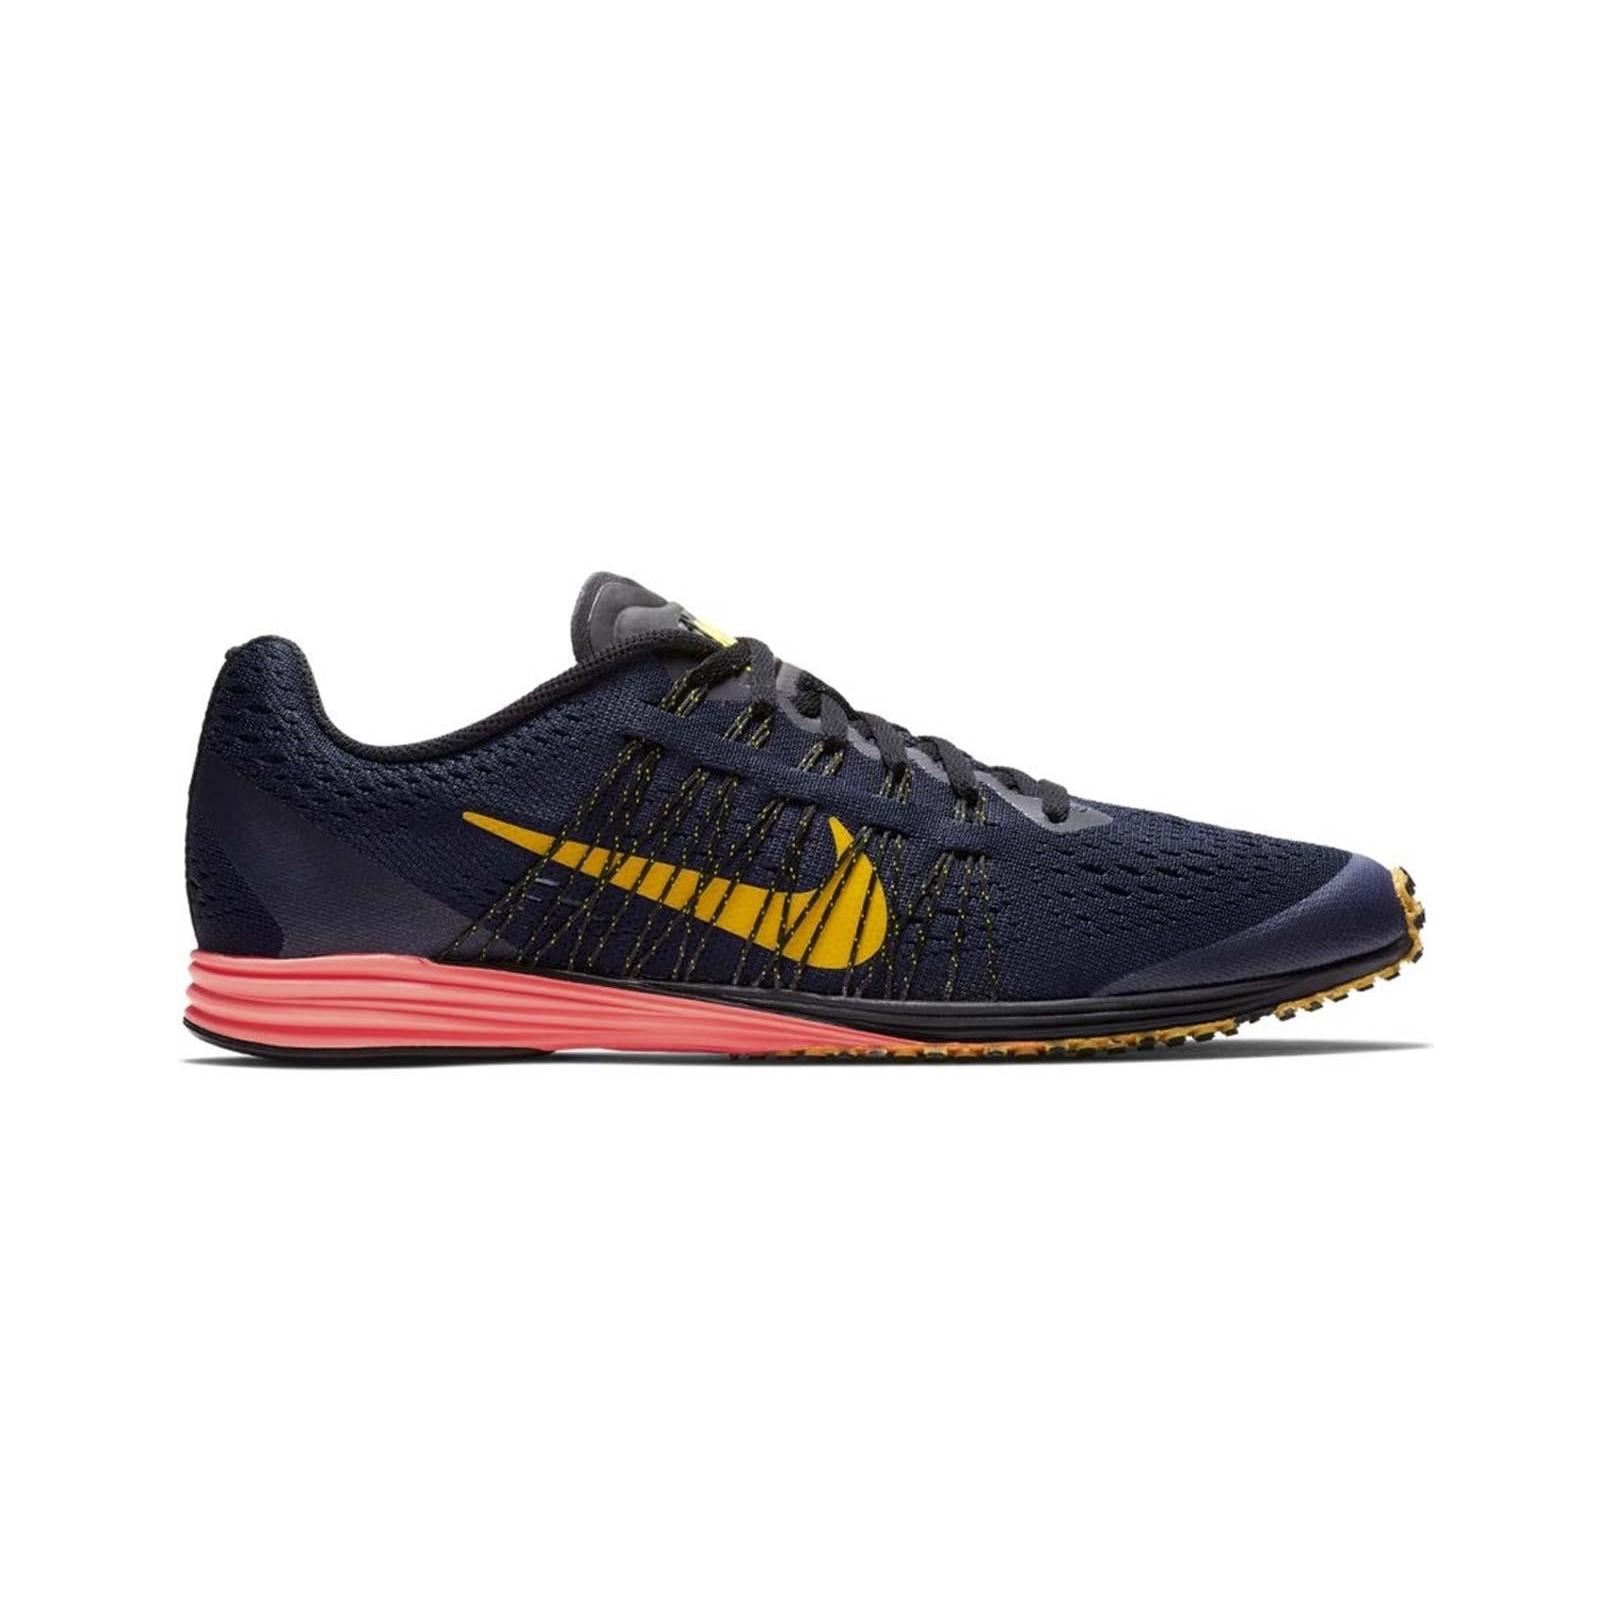 save off fa1da 54201 Nike-LUNARSPIDER 6